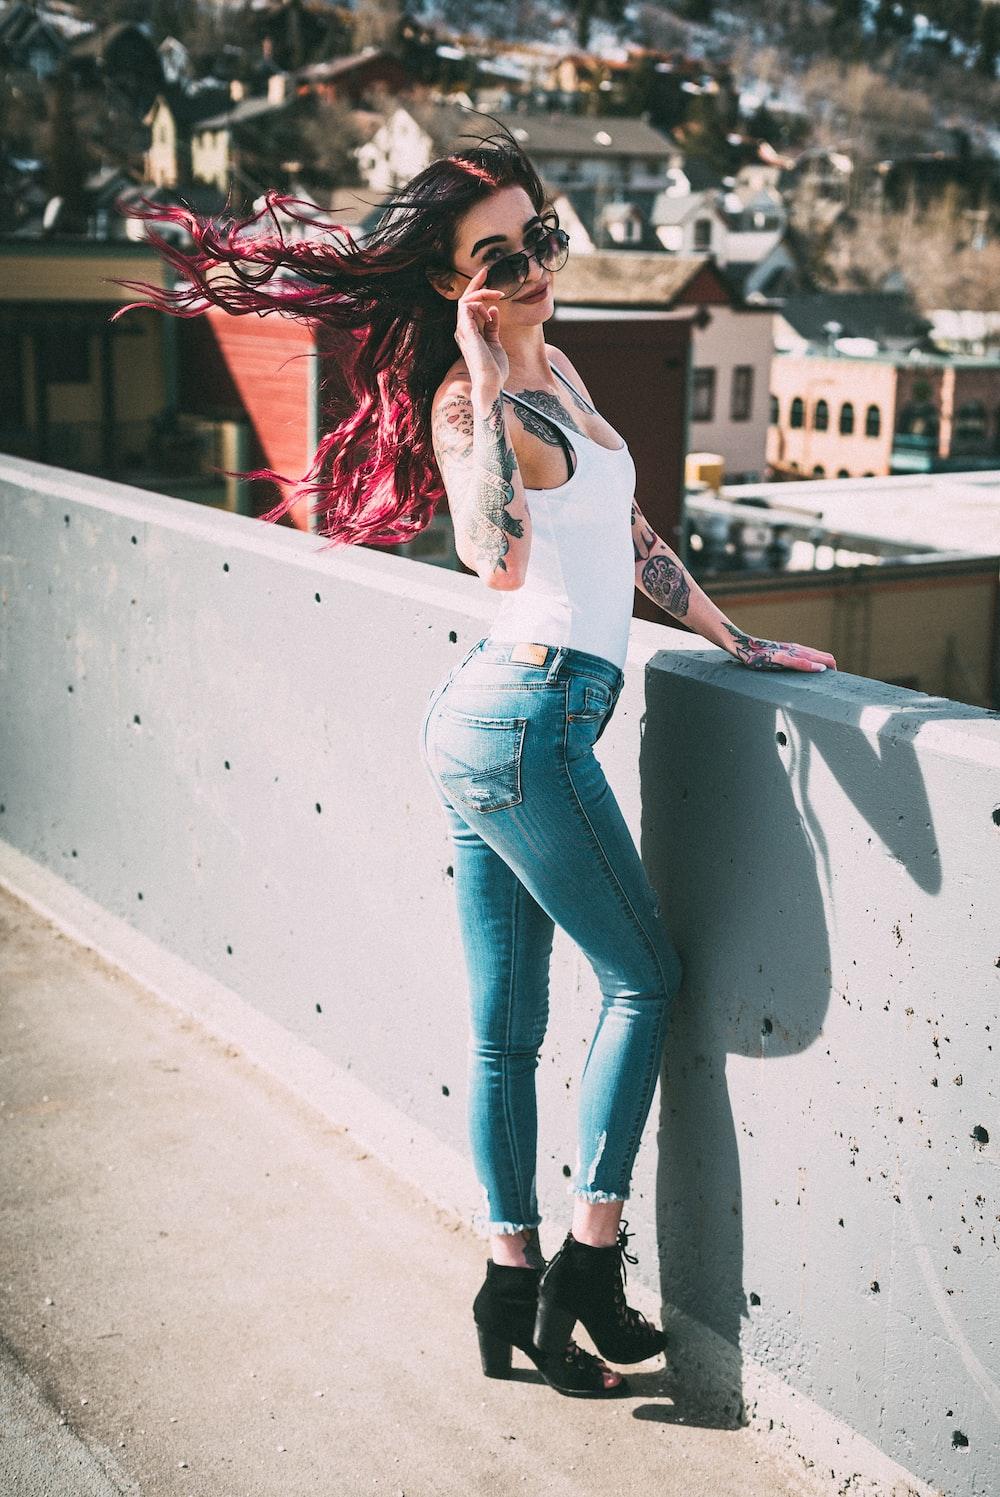 woman standing near concrete rails